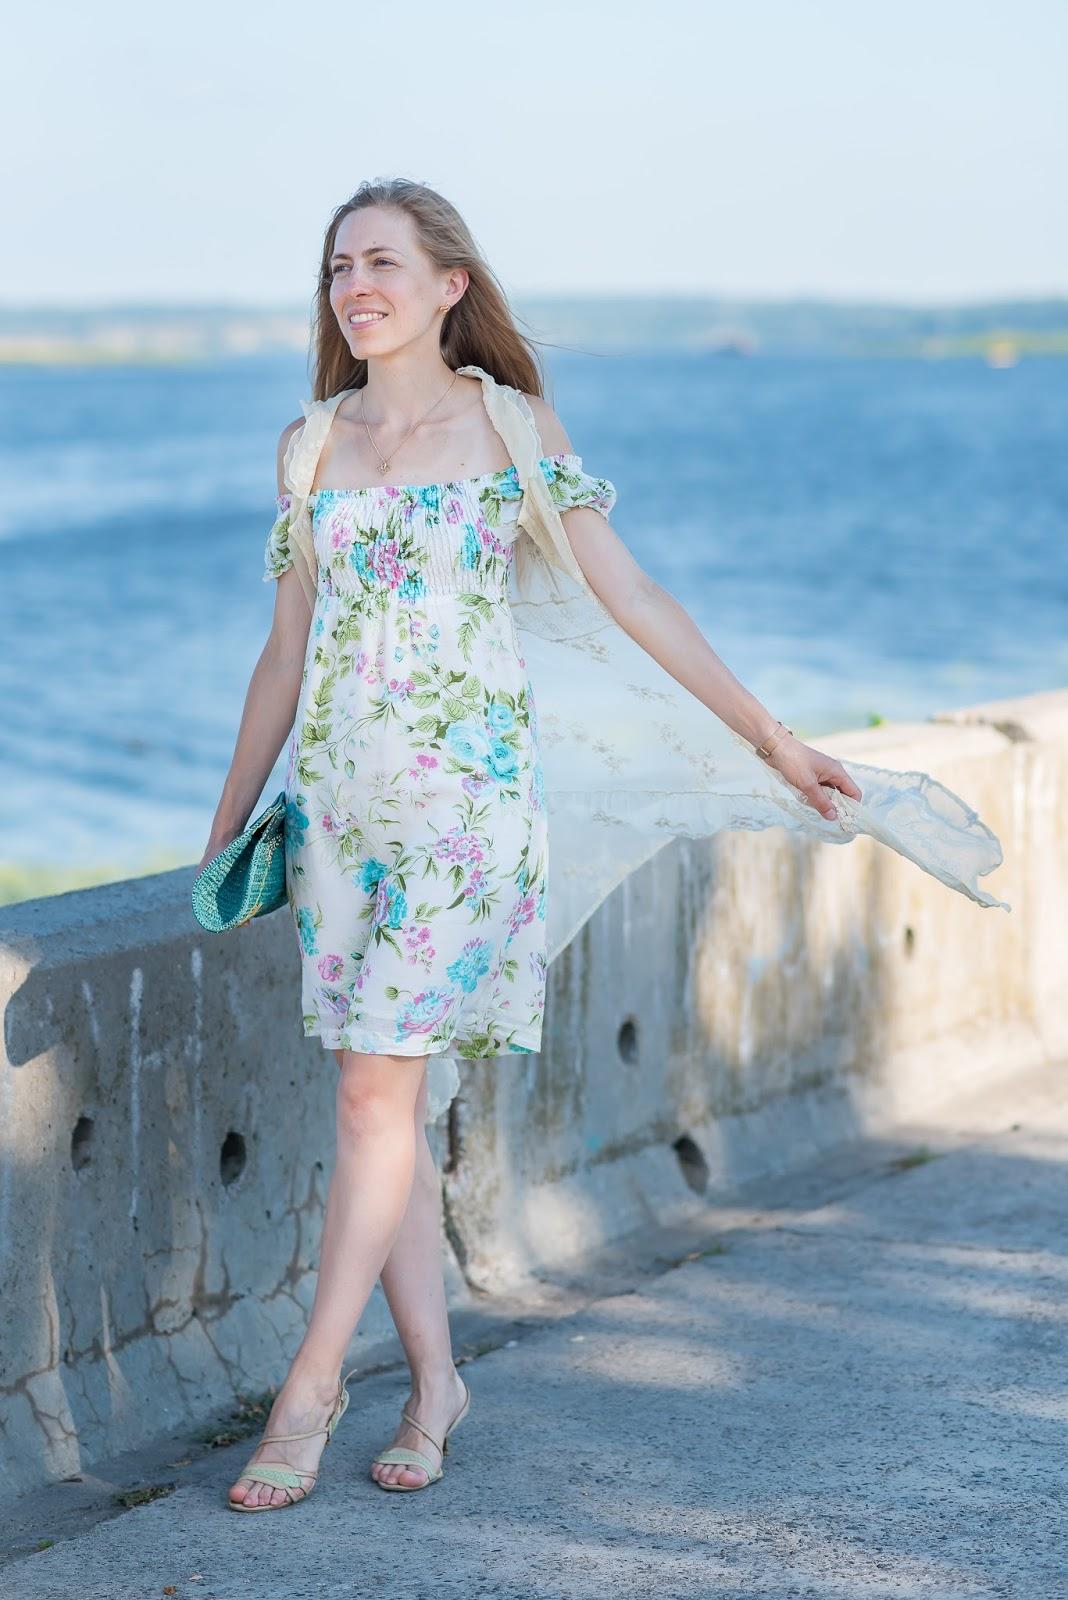 Вишита безрукавка та сукня з відкритими плечима - на вітрі / Embroidered vest and off-shoulder dress - in the wind